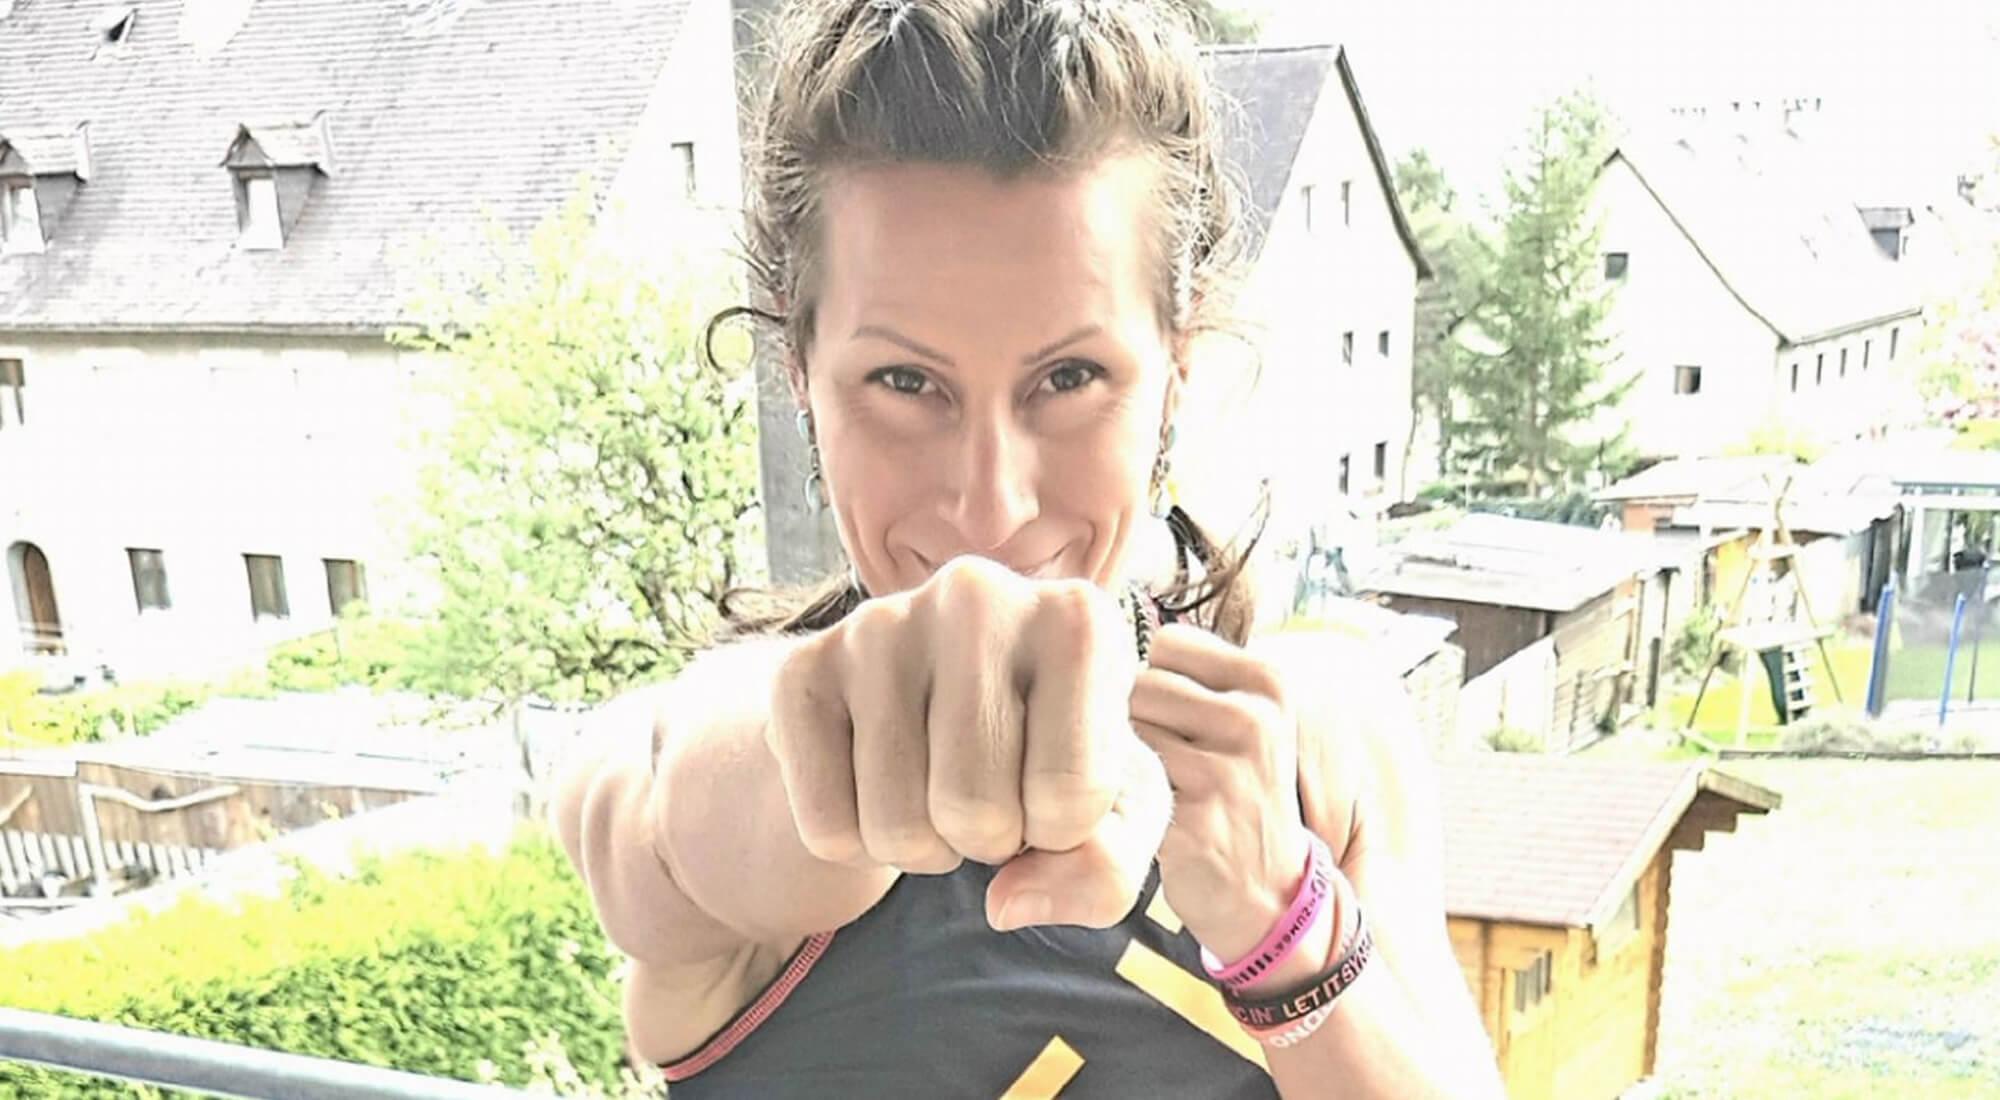 Venusblume Lichtzentrum Melinda Hebenstreit Zumba Kurse Instruktor Nenzing Hohenems